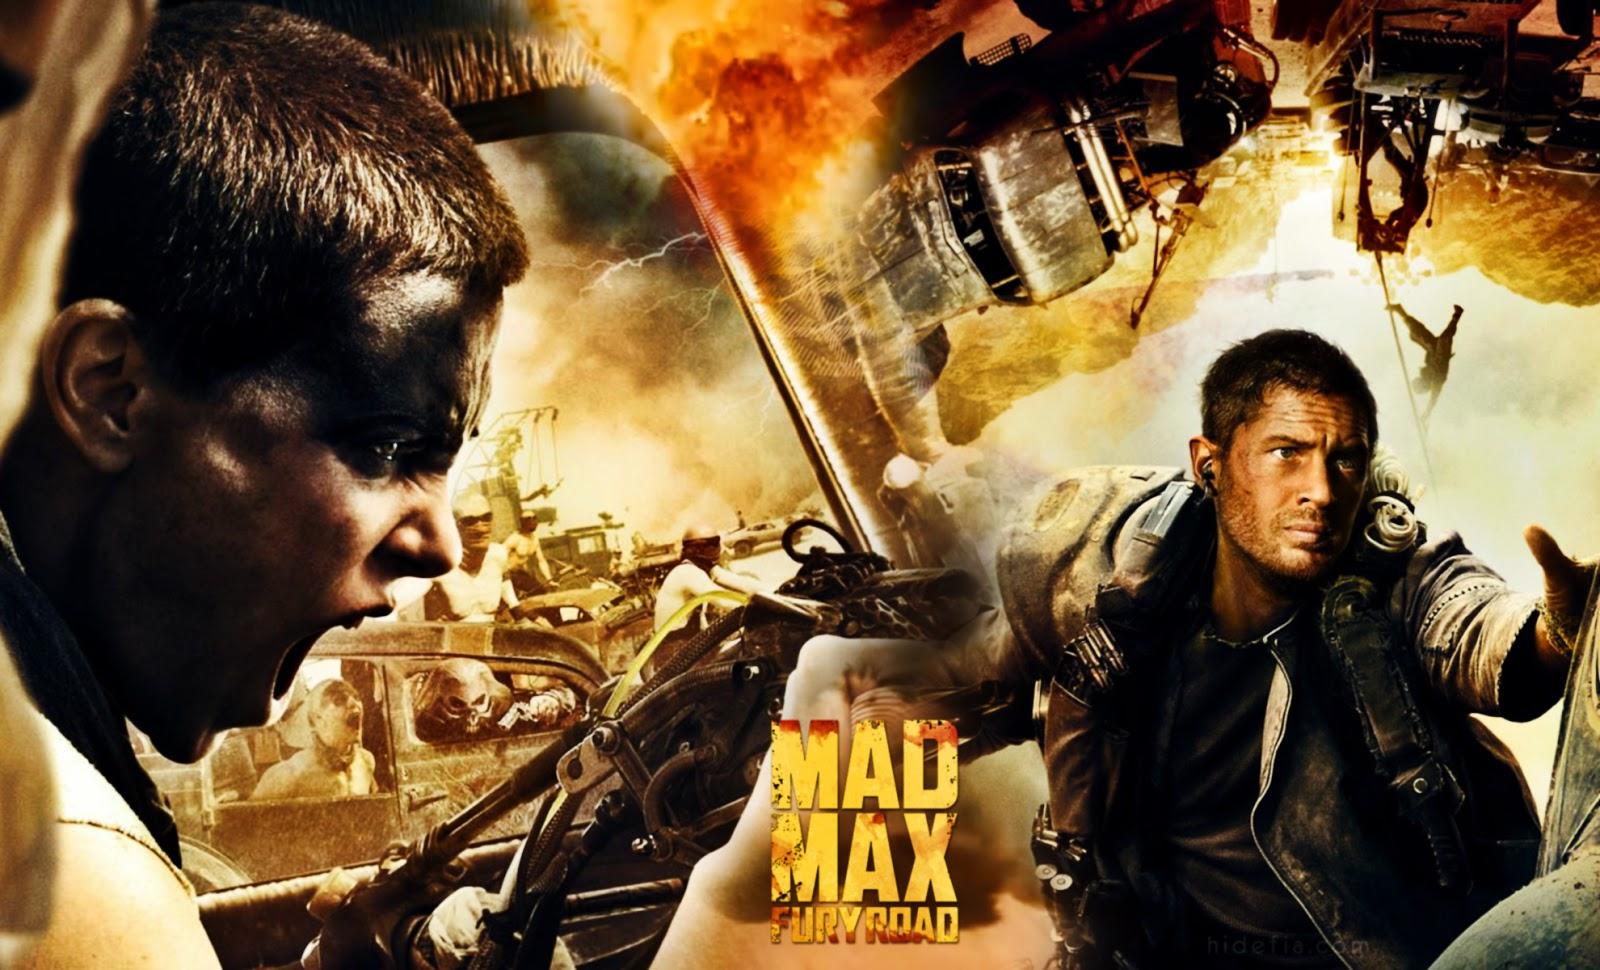 Download Top 32 Mad Max: Fury Road 2015 HD Desktop ...